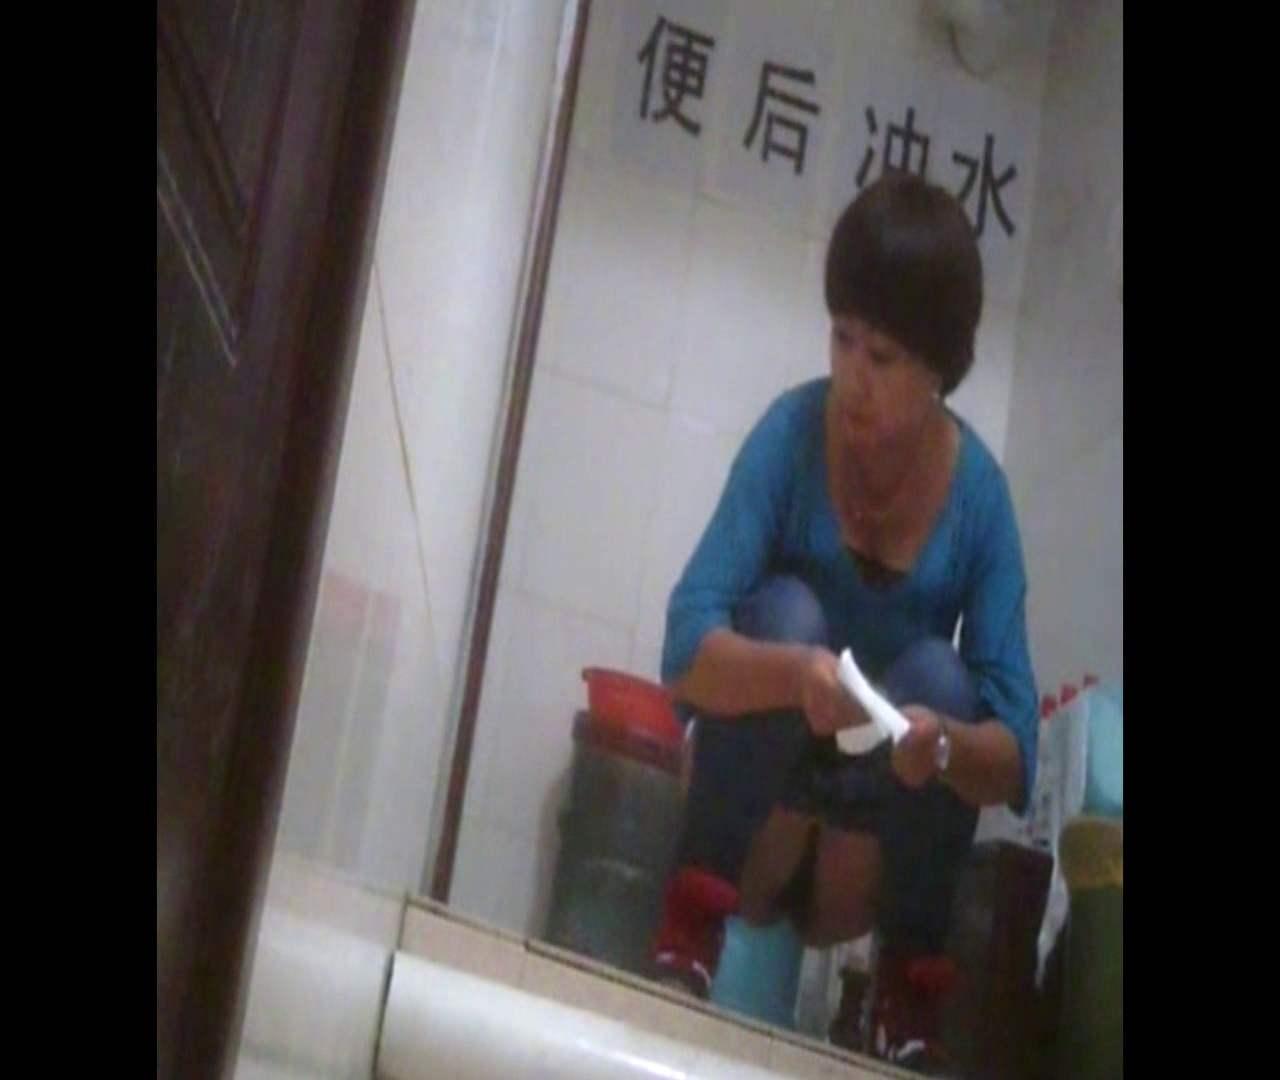 Vol.37 豊満な胸を持つマッシュルームカットな彼女 洗面所 | 丸見え  63画像 13